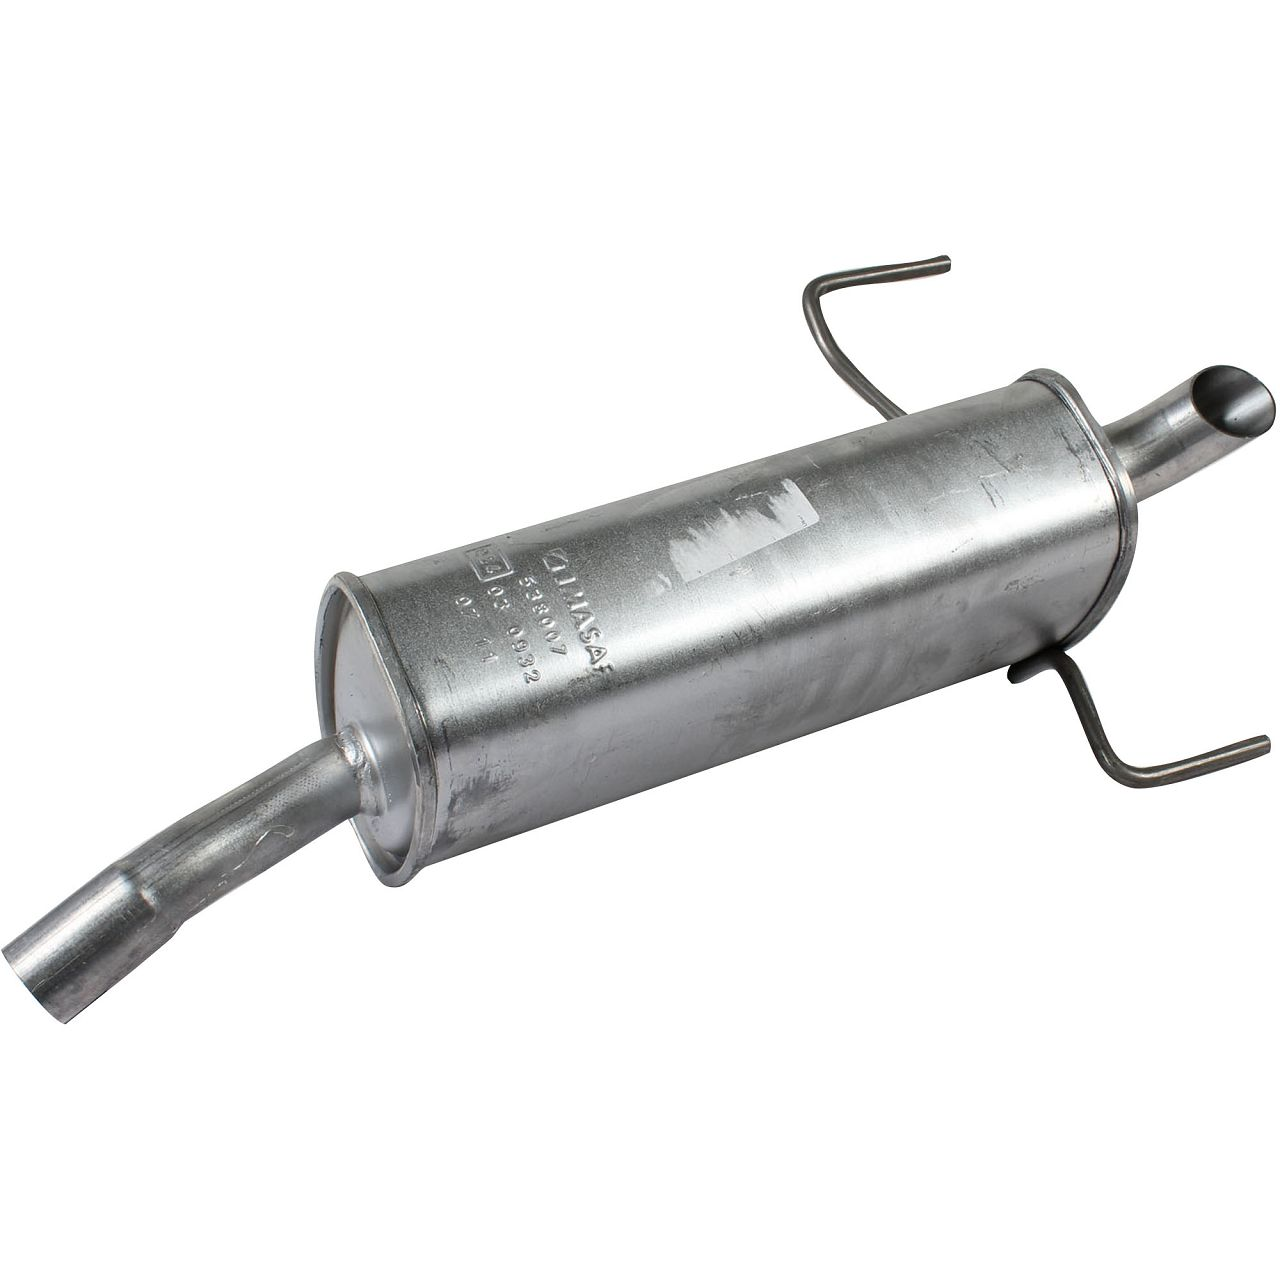 IMASAF Schalldämpfer Endschalldämpfer für OPEL ASTRA H 1.4 90 PS 1.6 105 PS